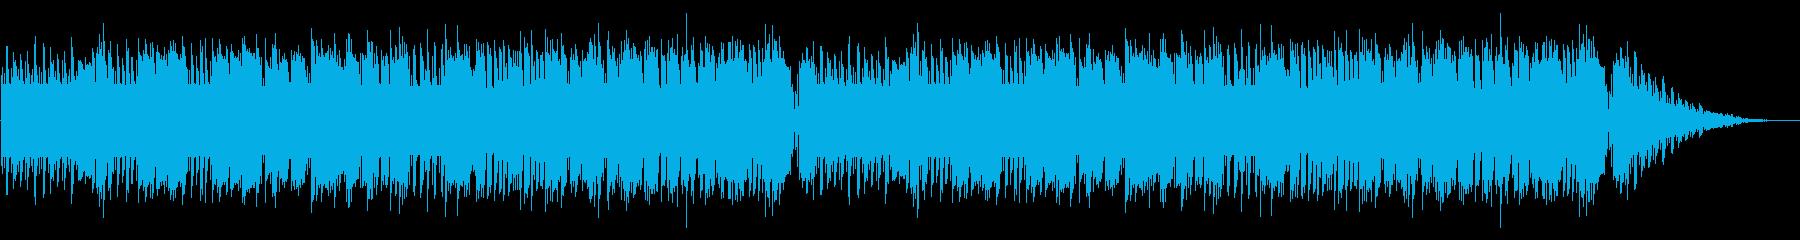 NES アクションC07-1(ステージ5の再生済みの波形